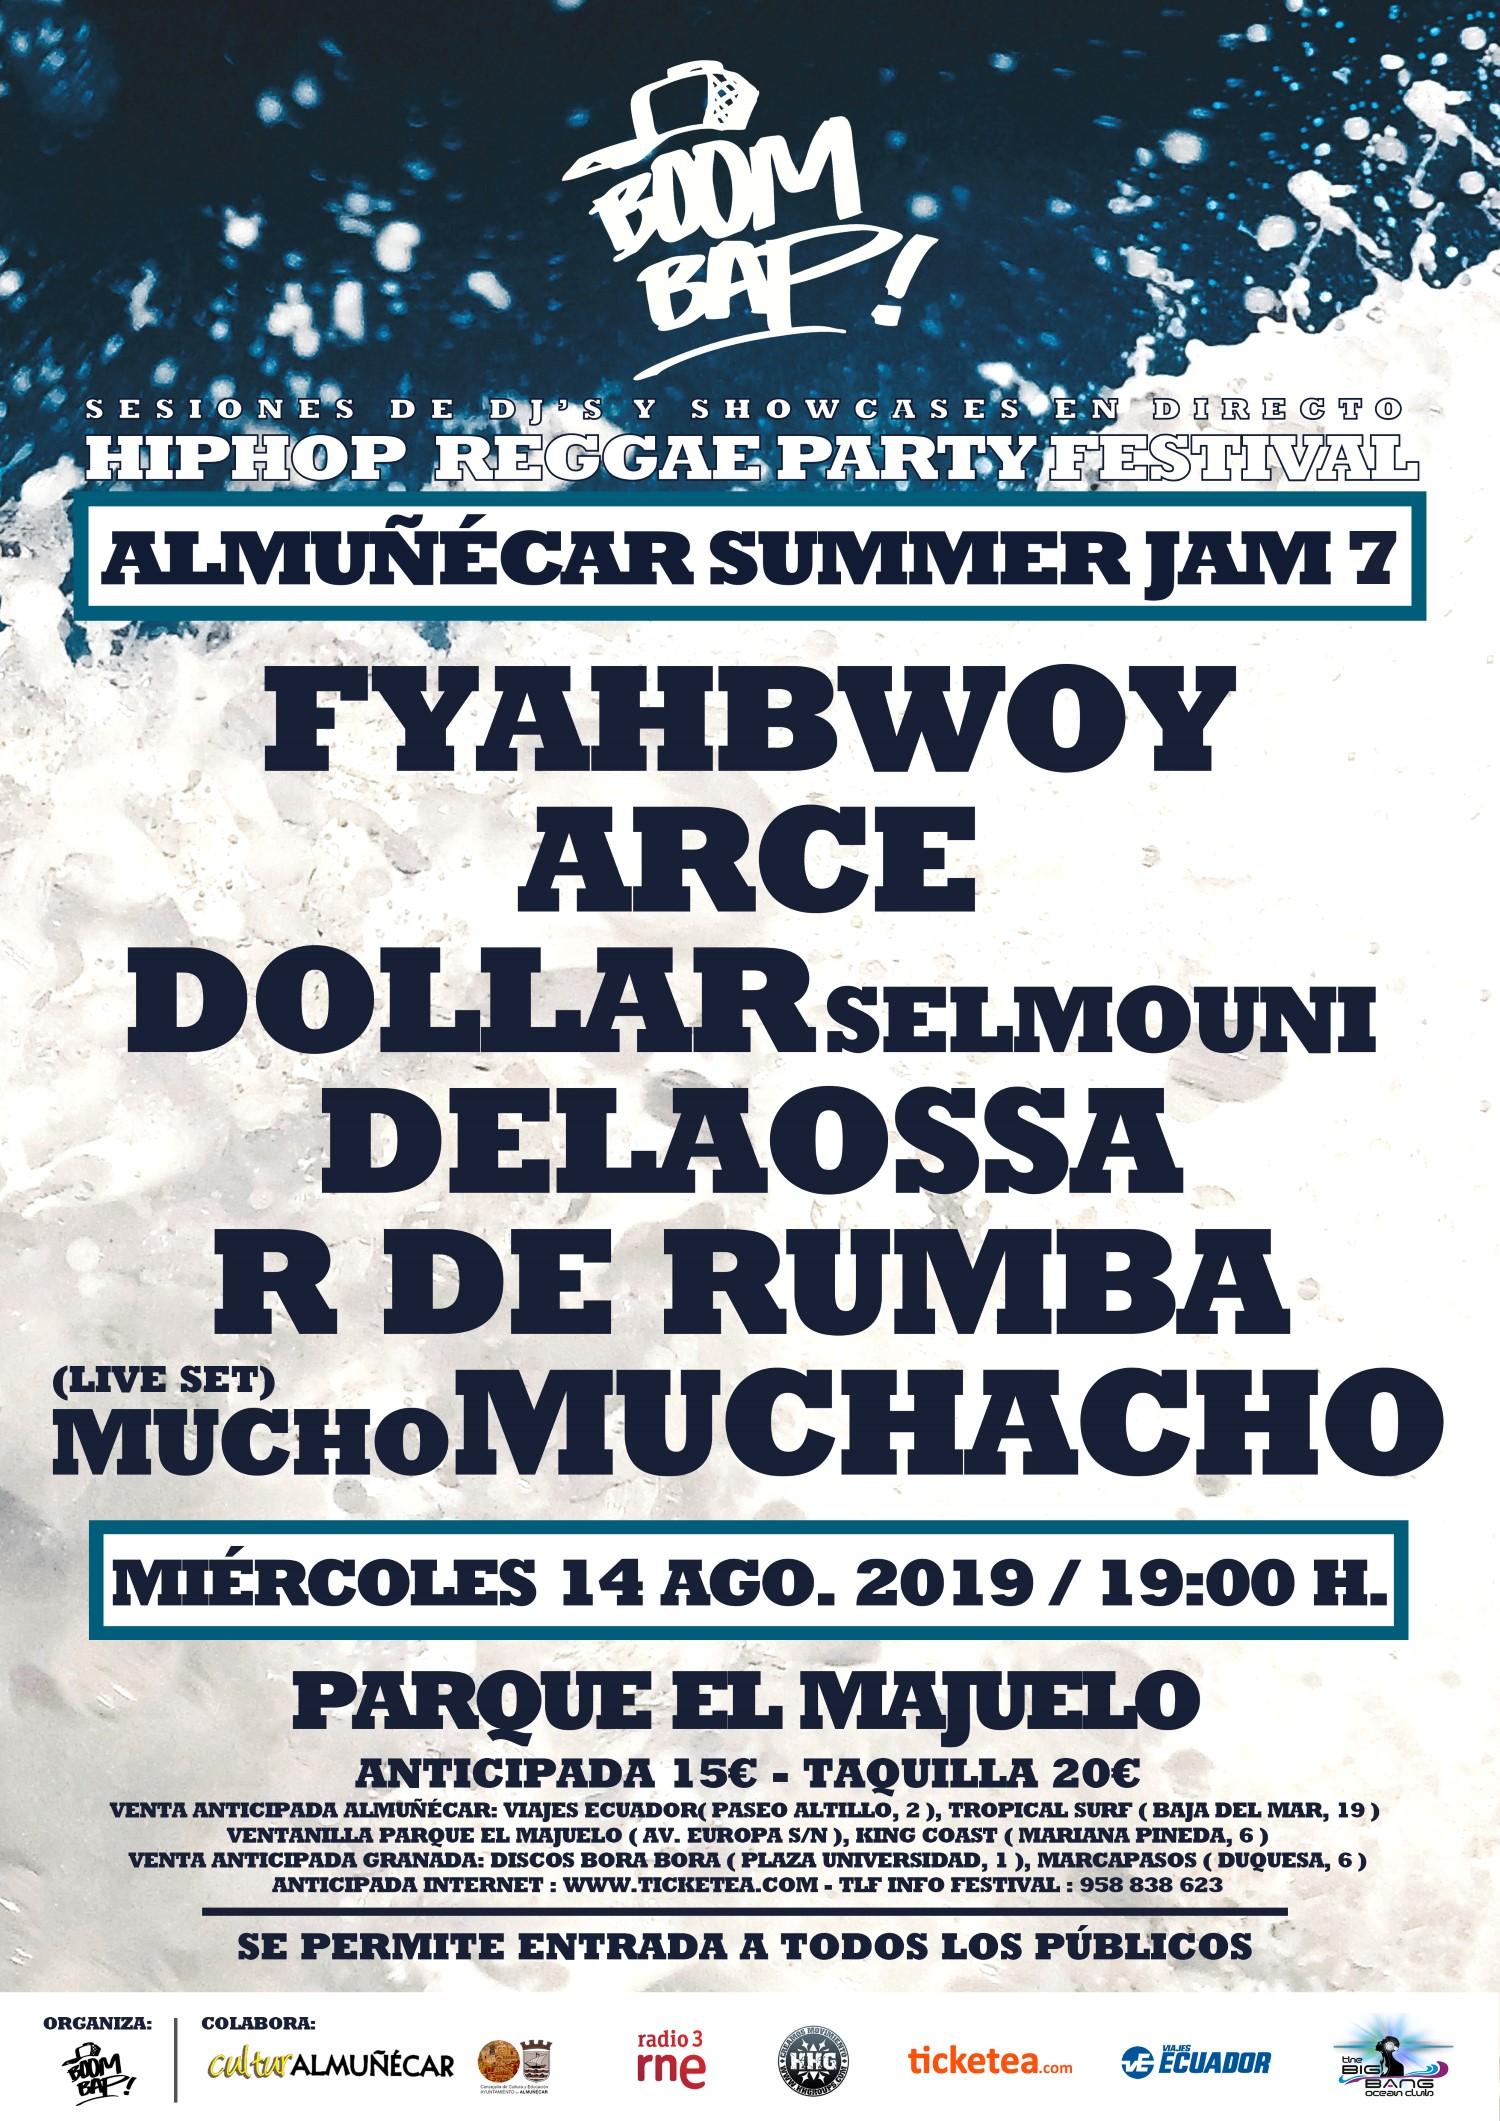 Boom Bap! Summer Jam 7 en Almuñecar